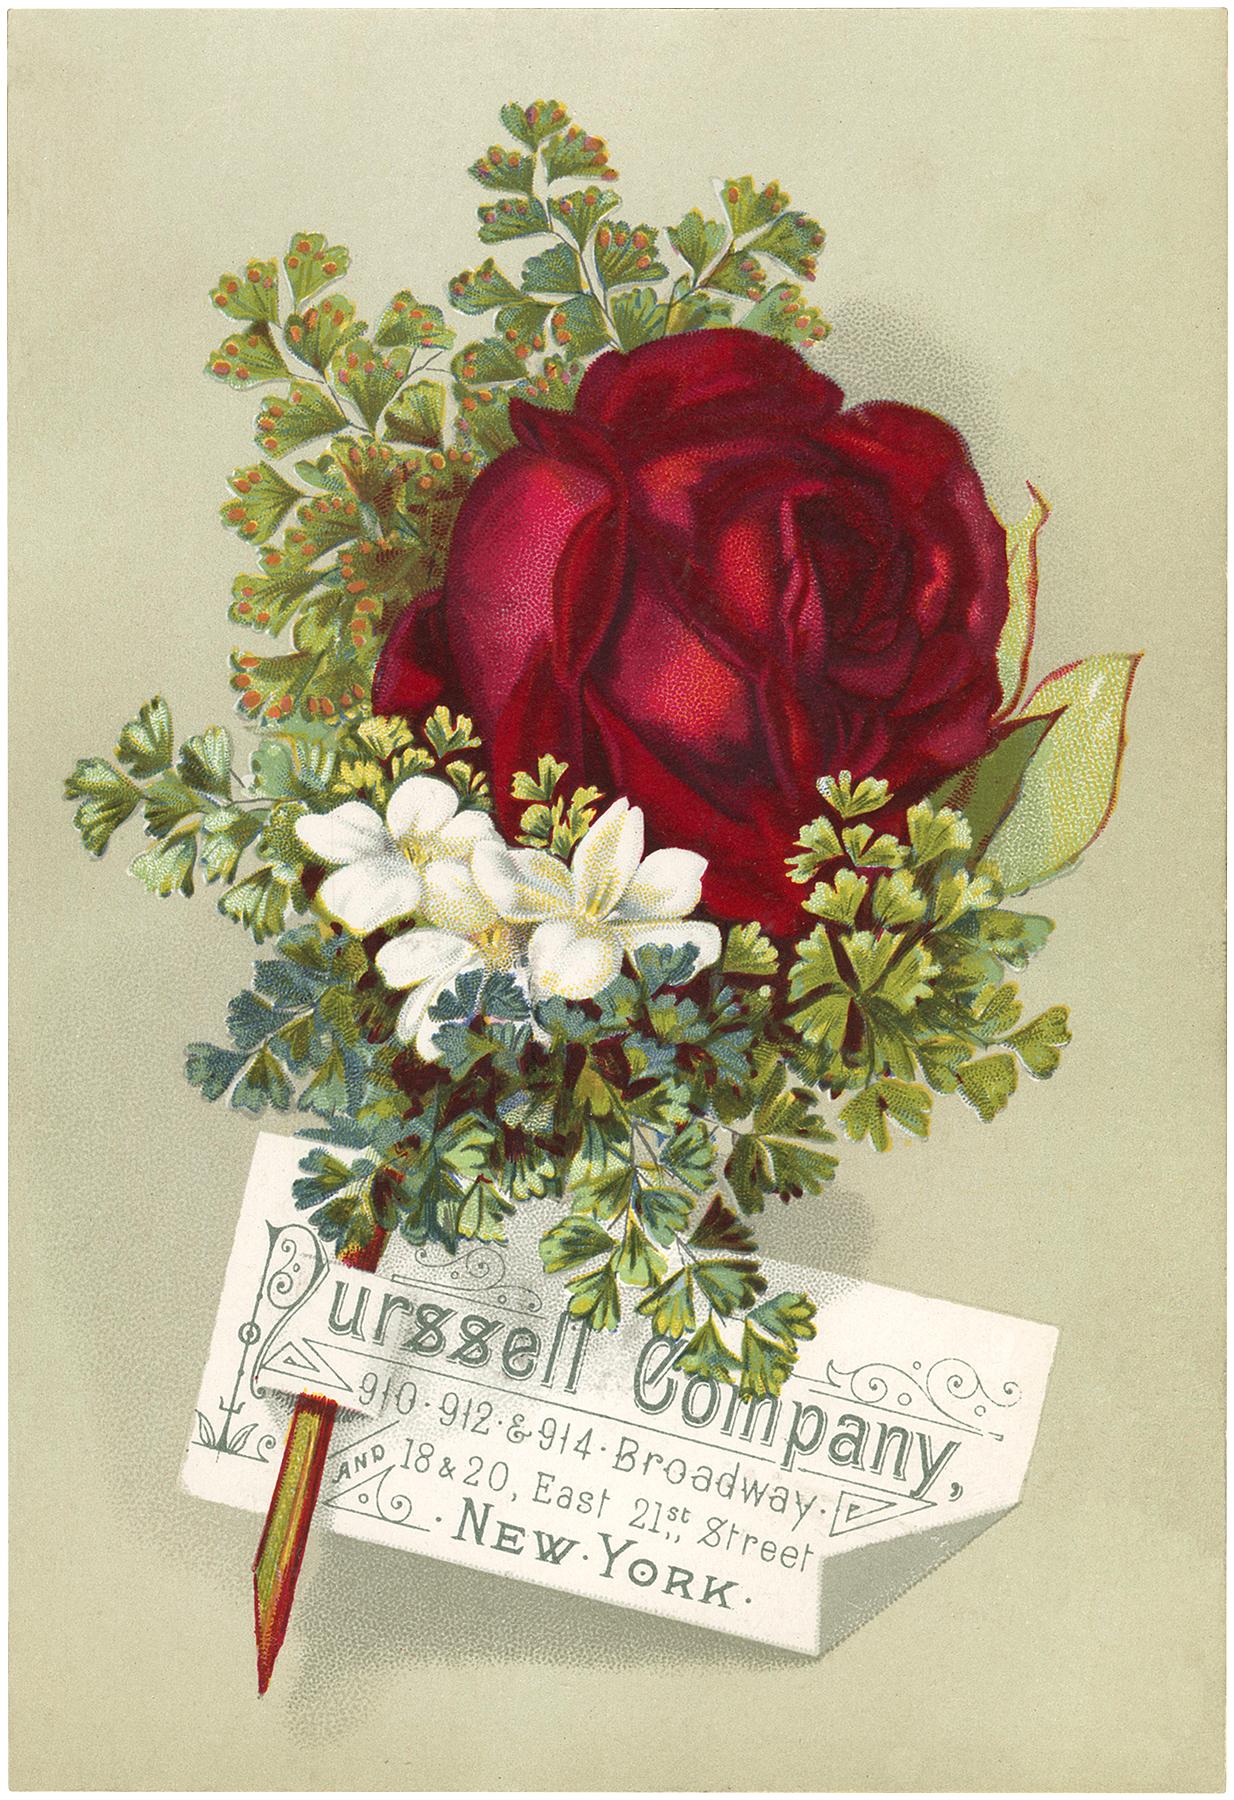 Vintage Rose Advertisement